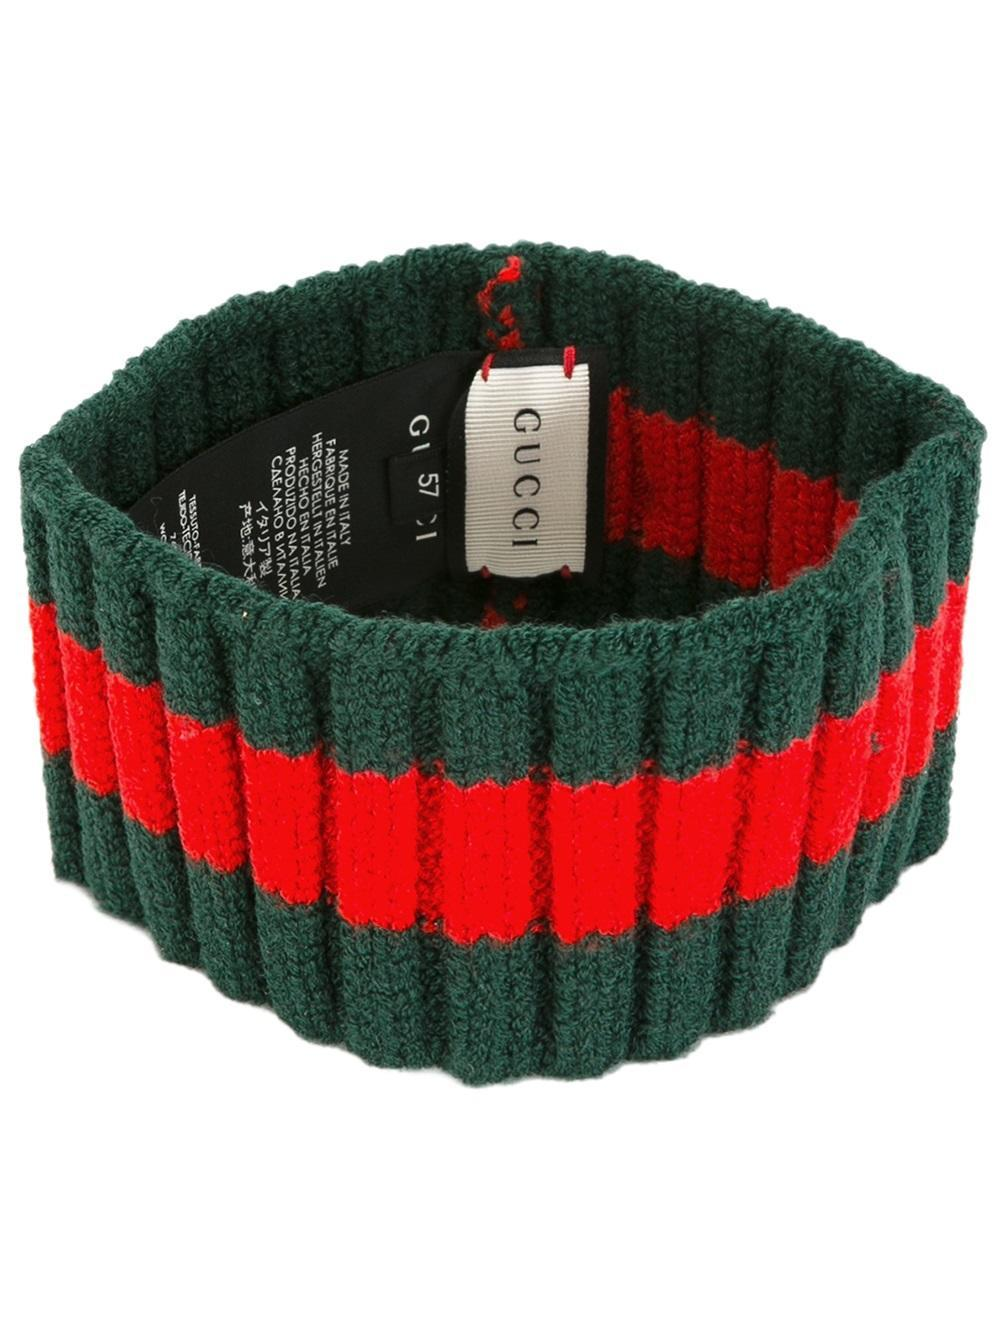 Gucci Stud Detail Ribbed Trim Headband in Green   Lyst